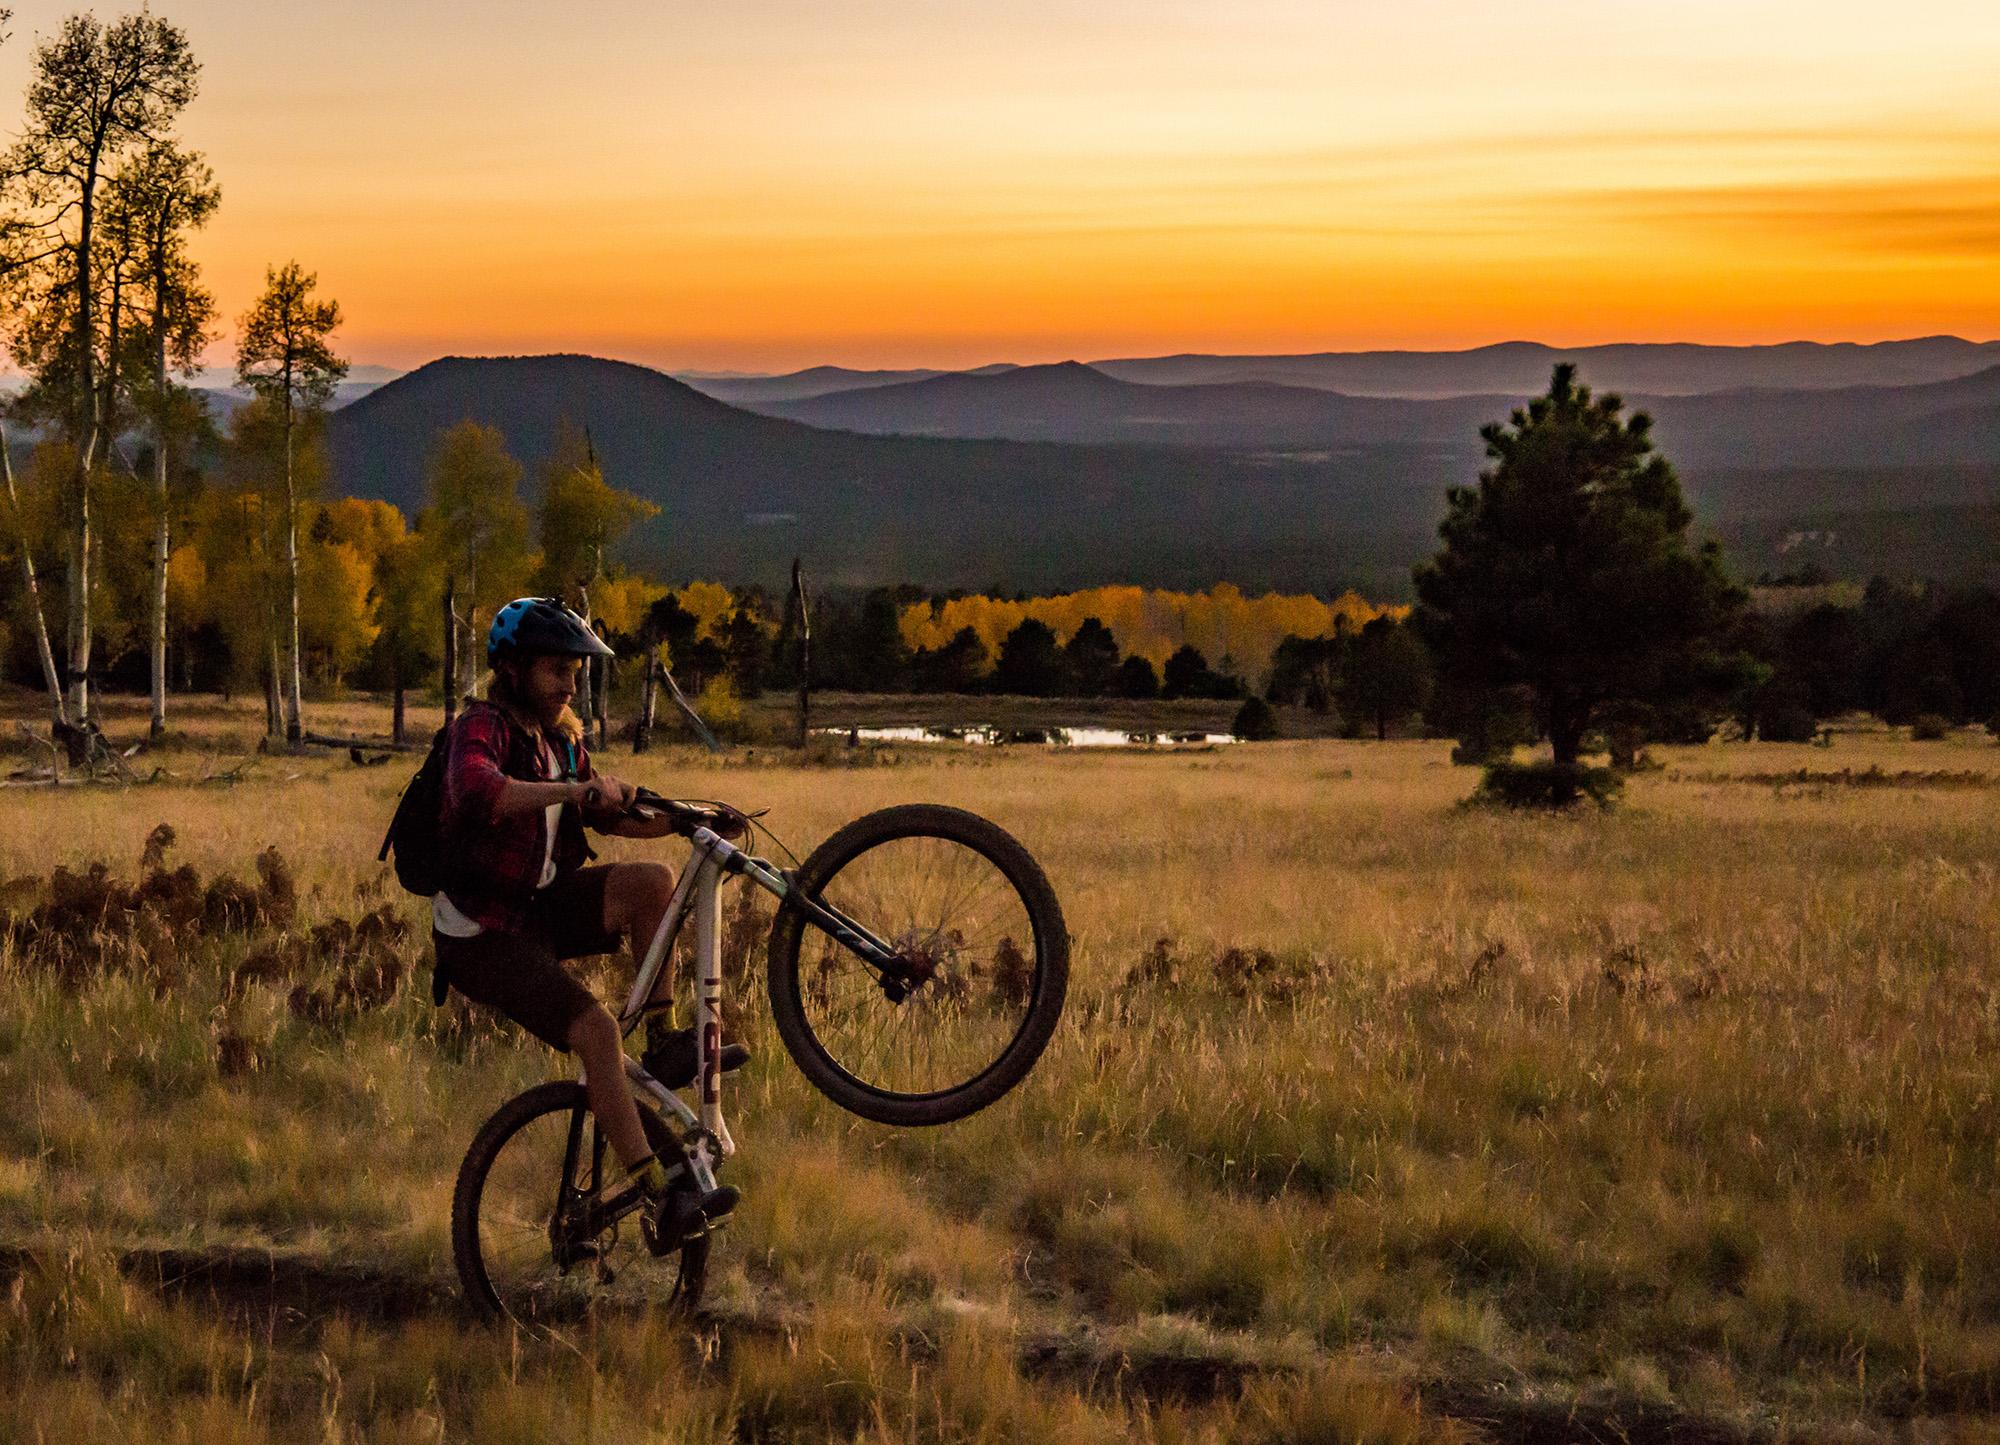 Readers' Photos: Submit Your Photos to Adventure Pro Magazine